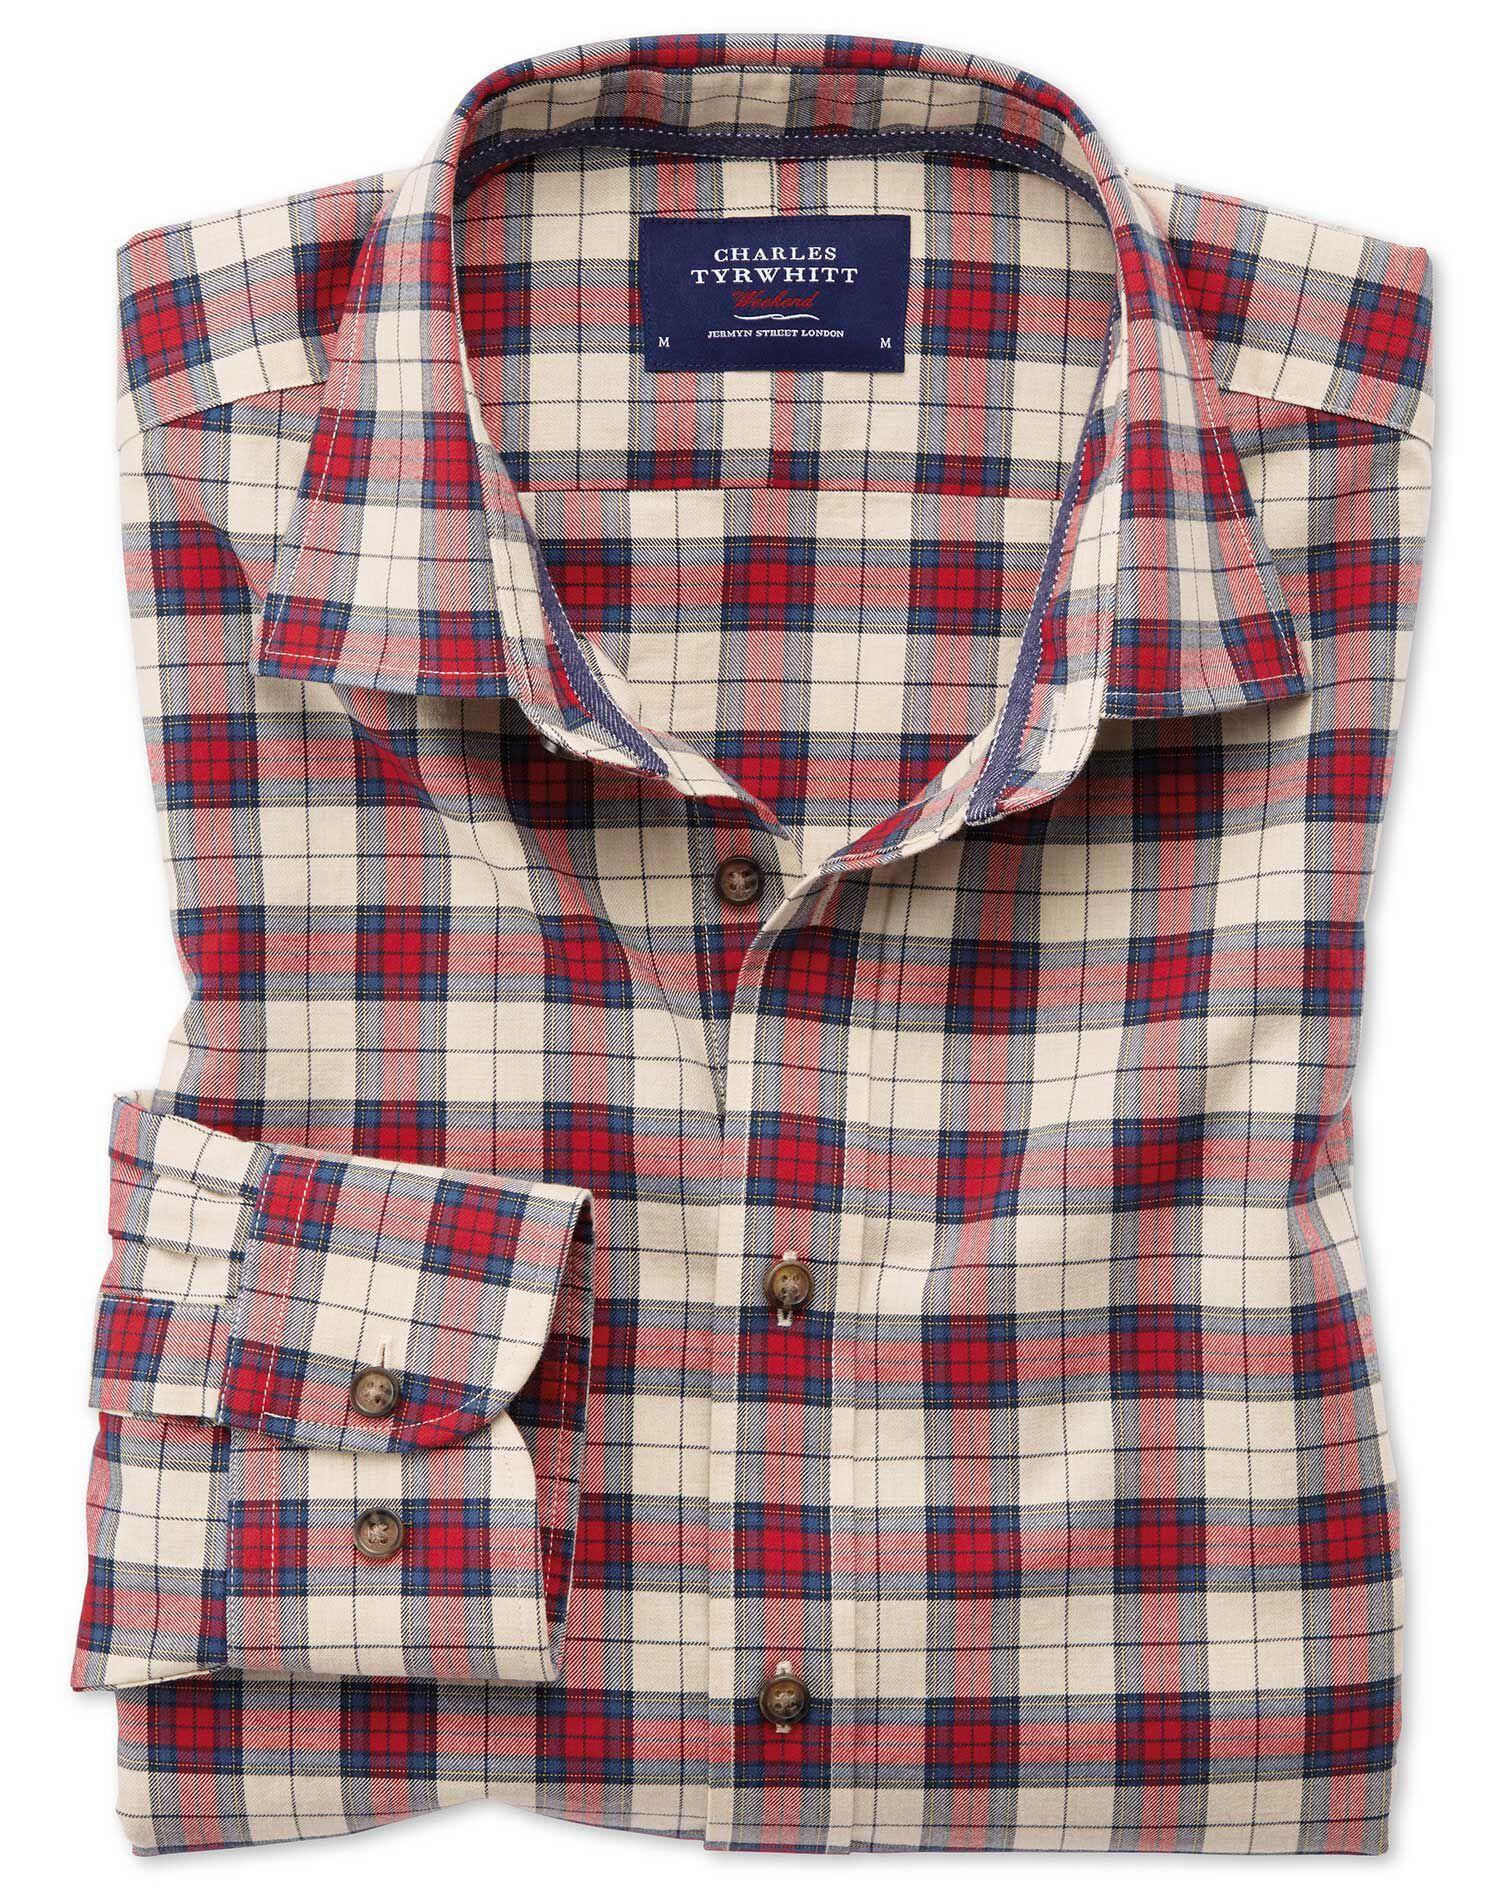 Classic Fit Heather Tartan Red Check Cotton Shirt Single Cuff Size XL by Charles Tyrwhitt